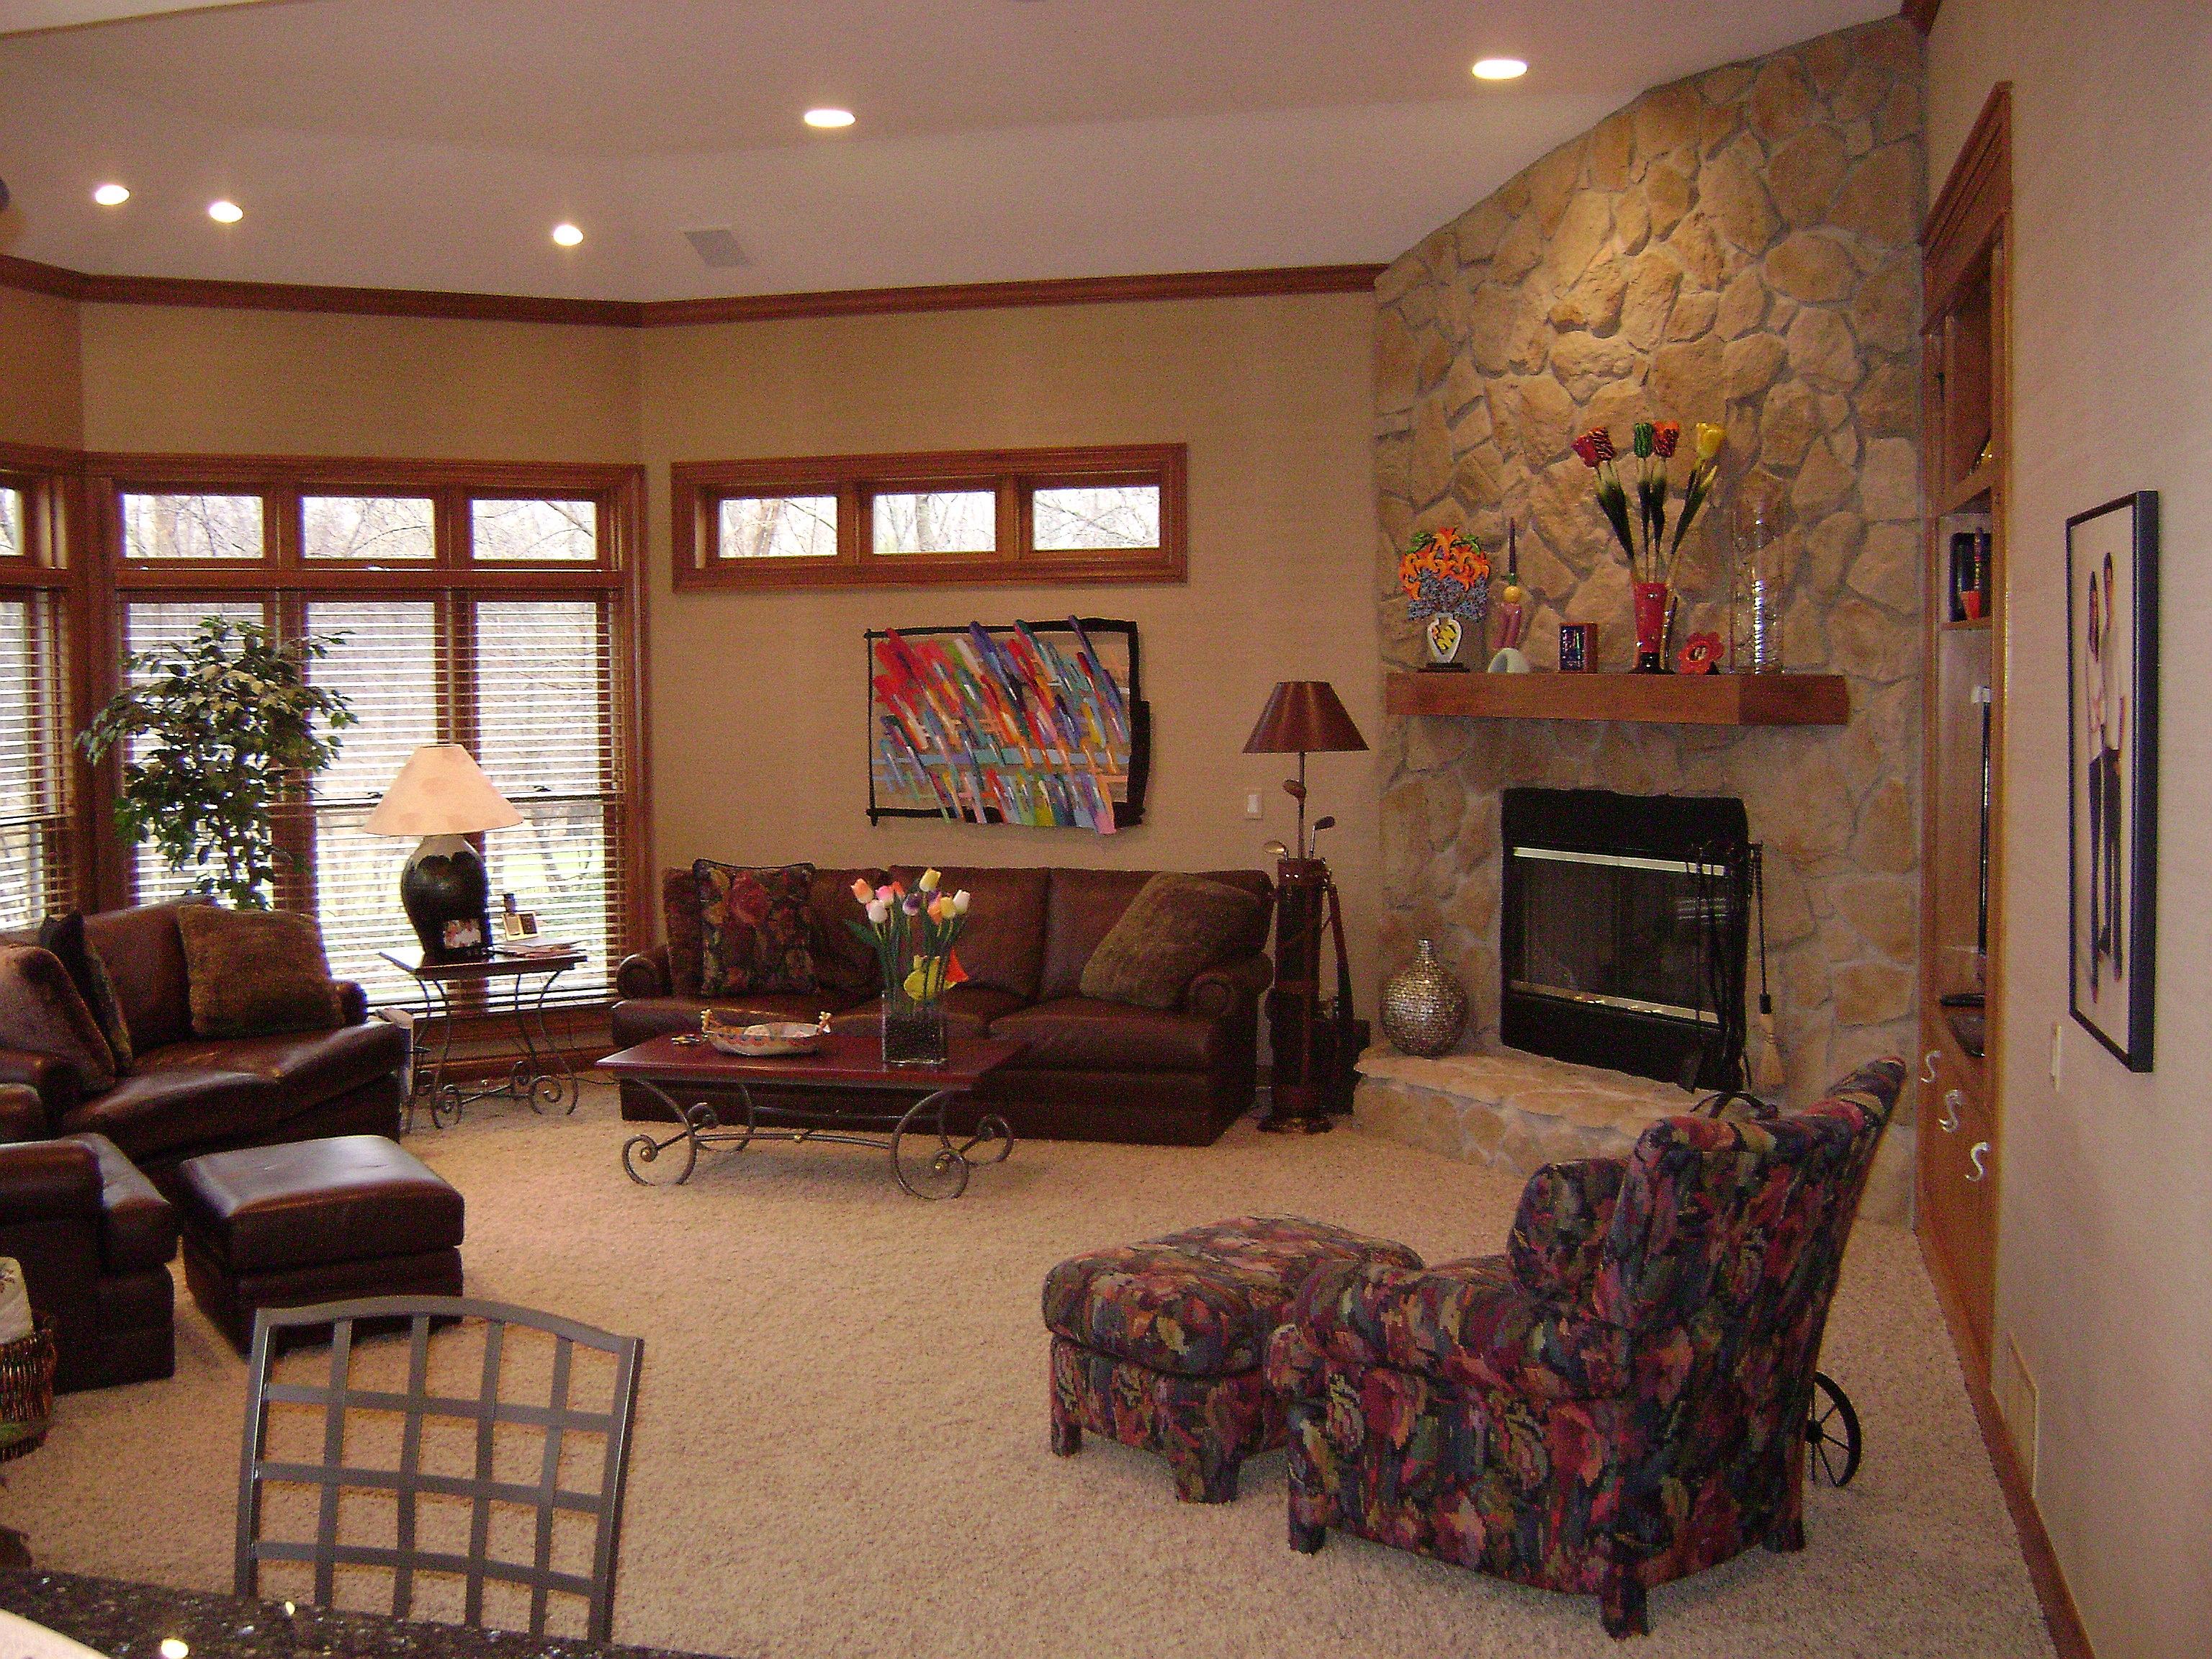 Residential / Chagrin Falls, Ohio